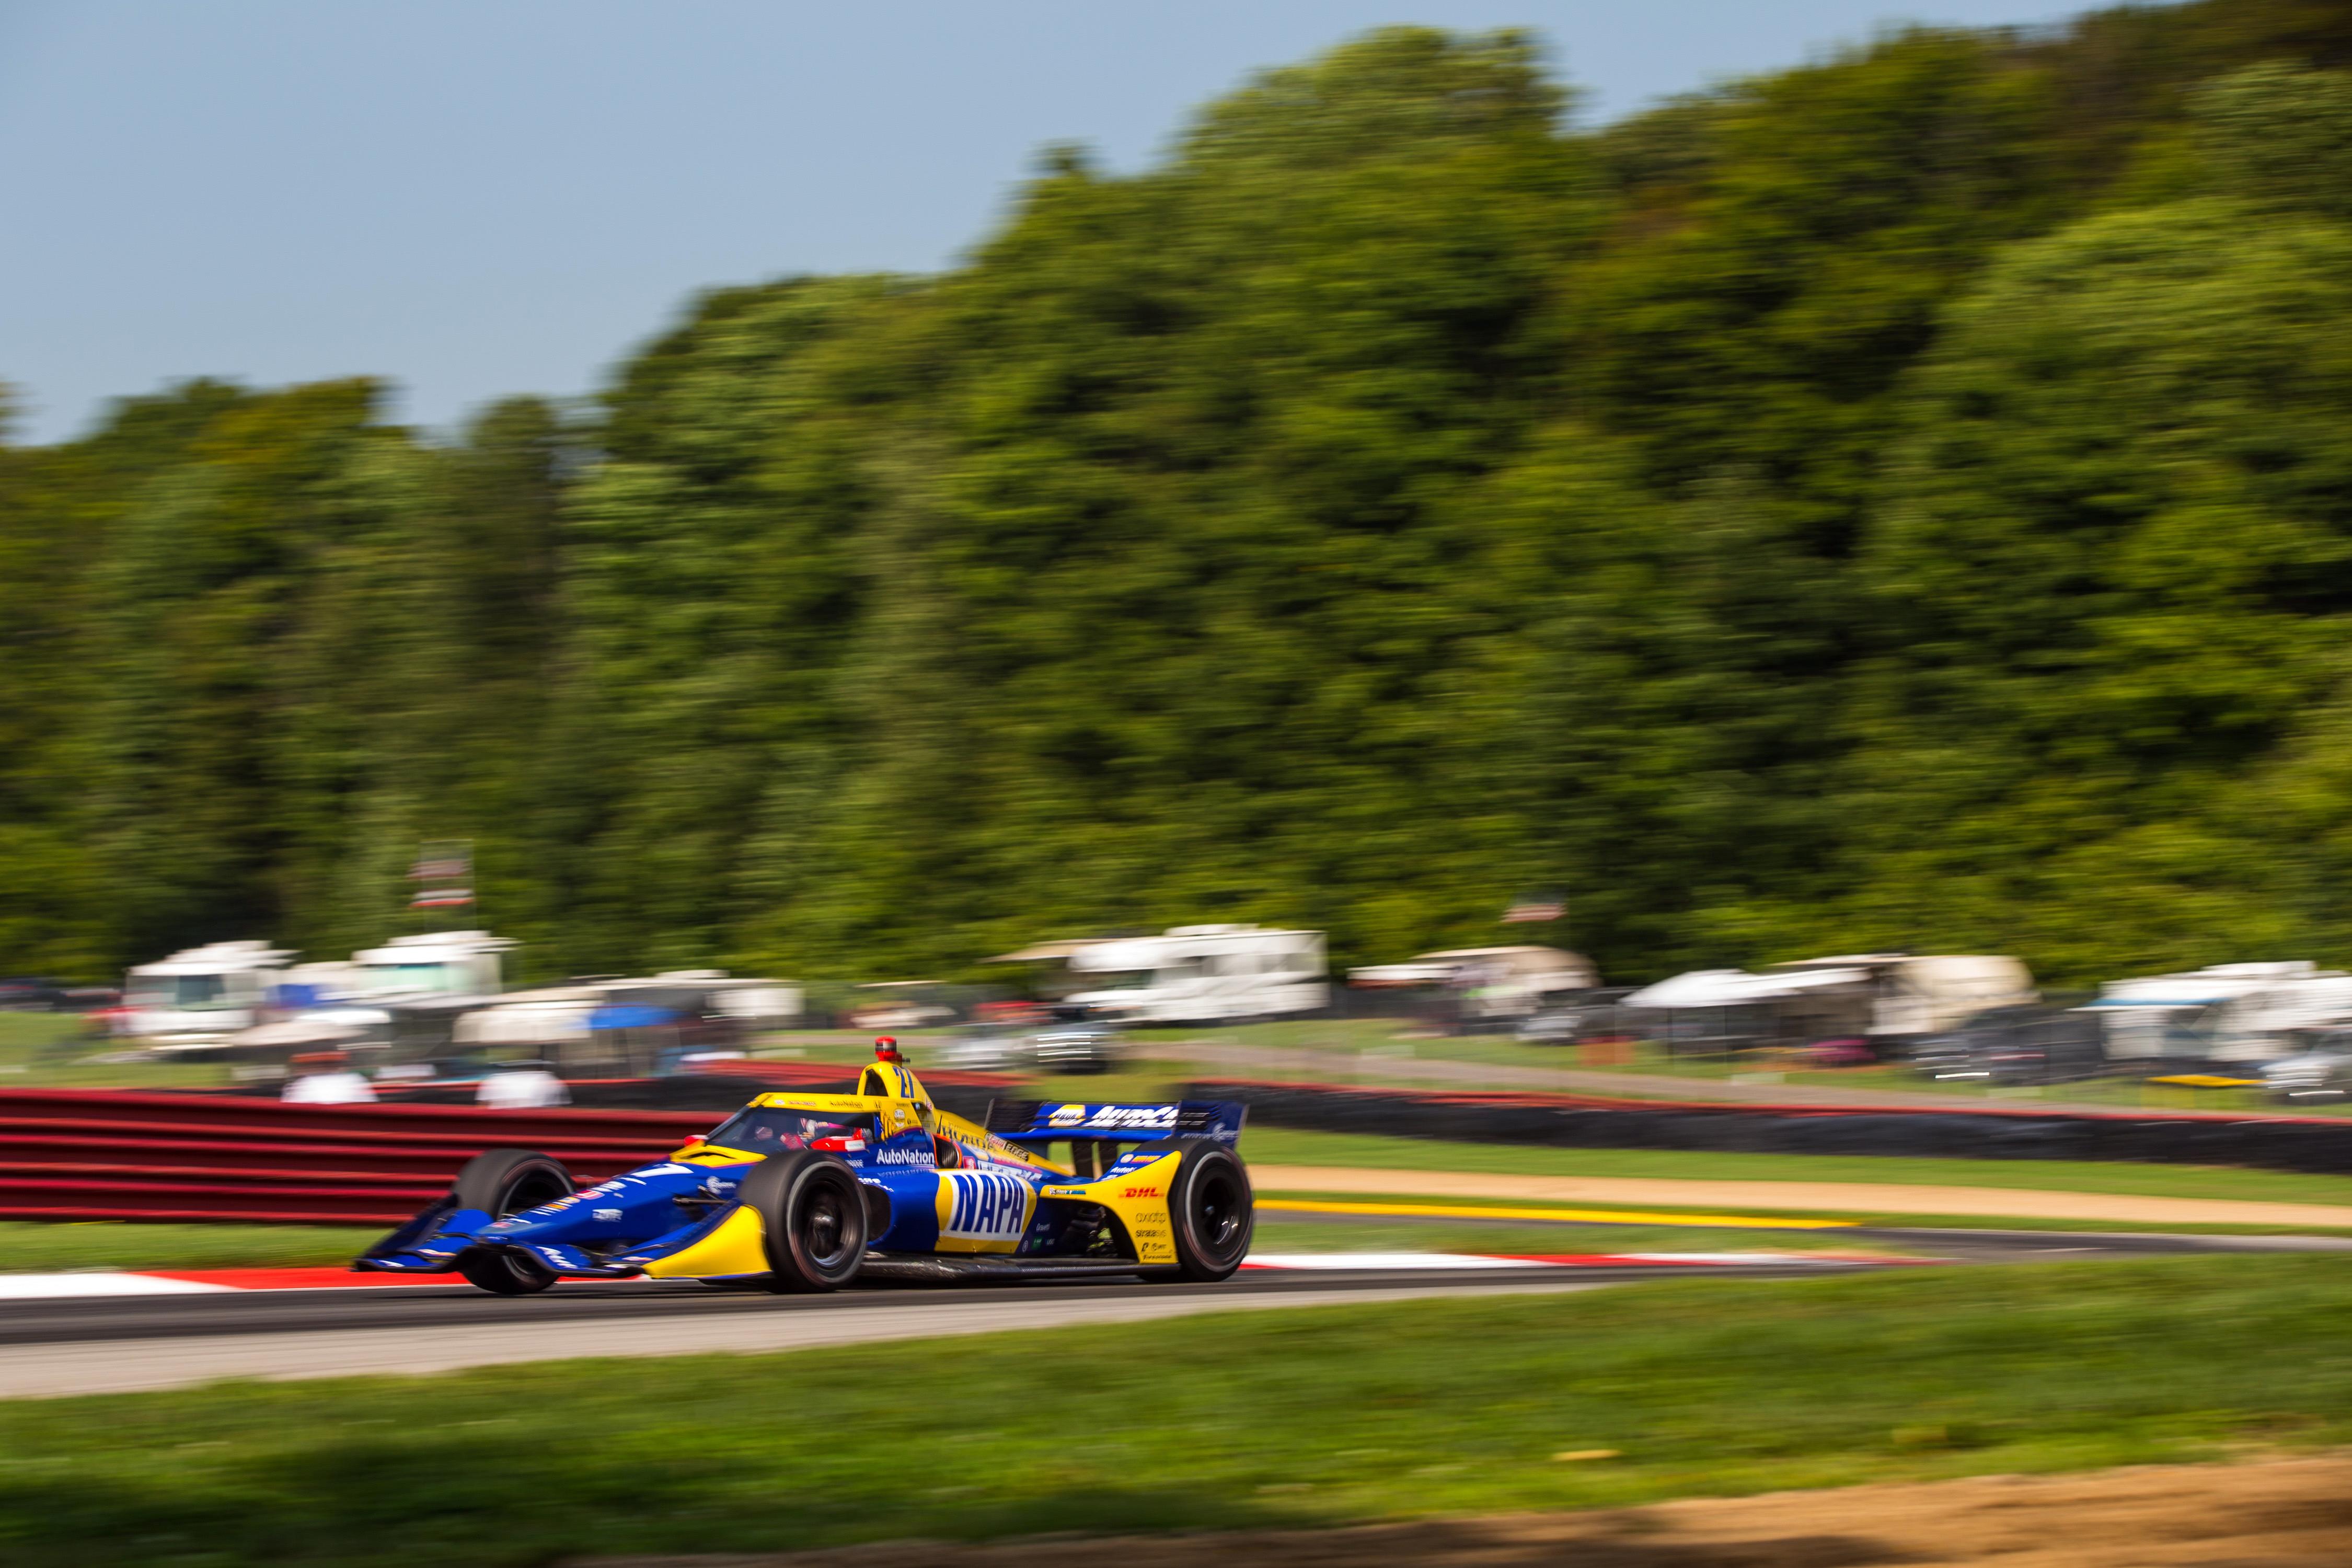 Alexander Rossi Mid-Ohio IndyCar 2020